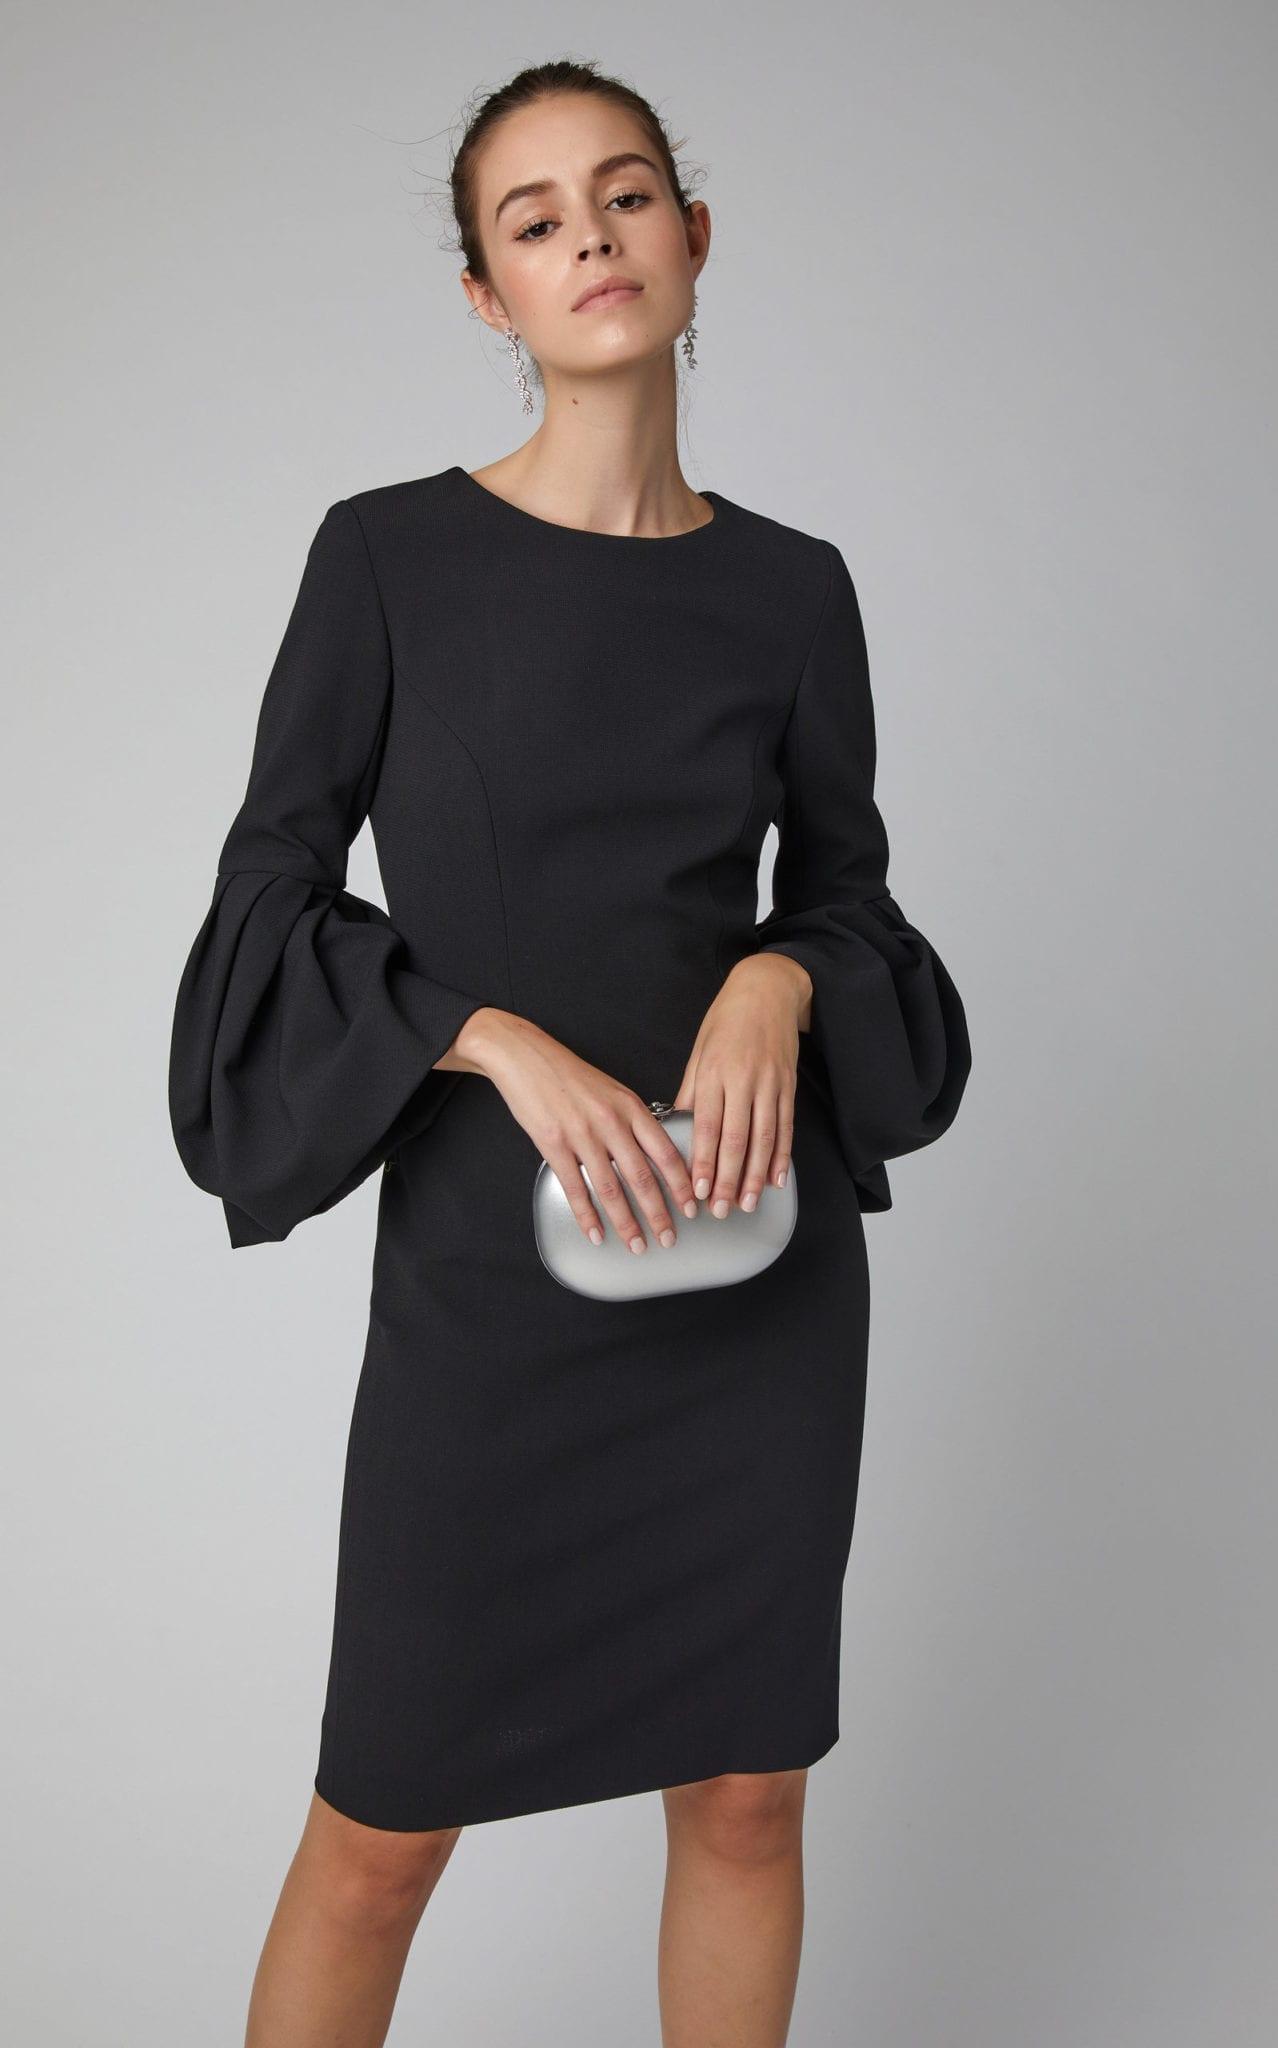 Carolina Herrera Balloon Sleeve Crepe Midi Sheath Black Dress